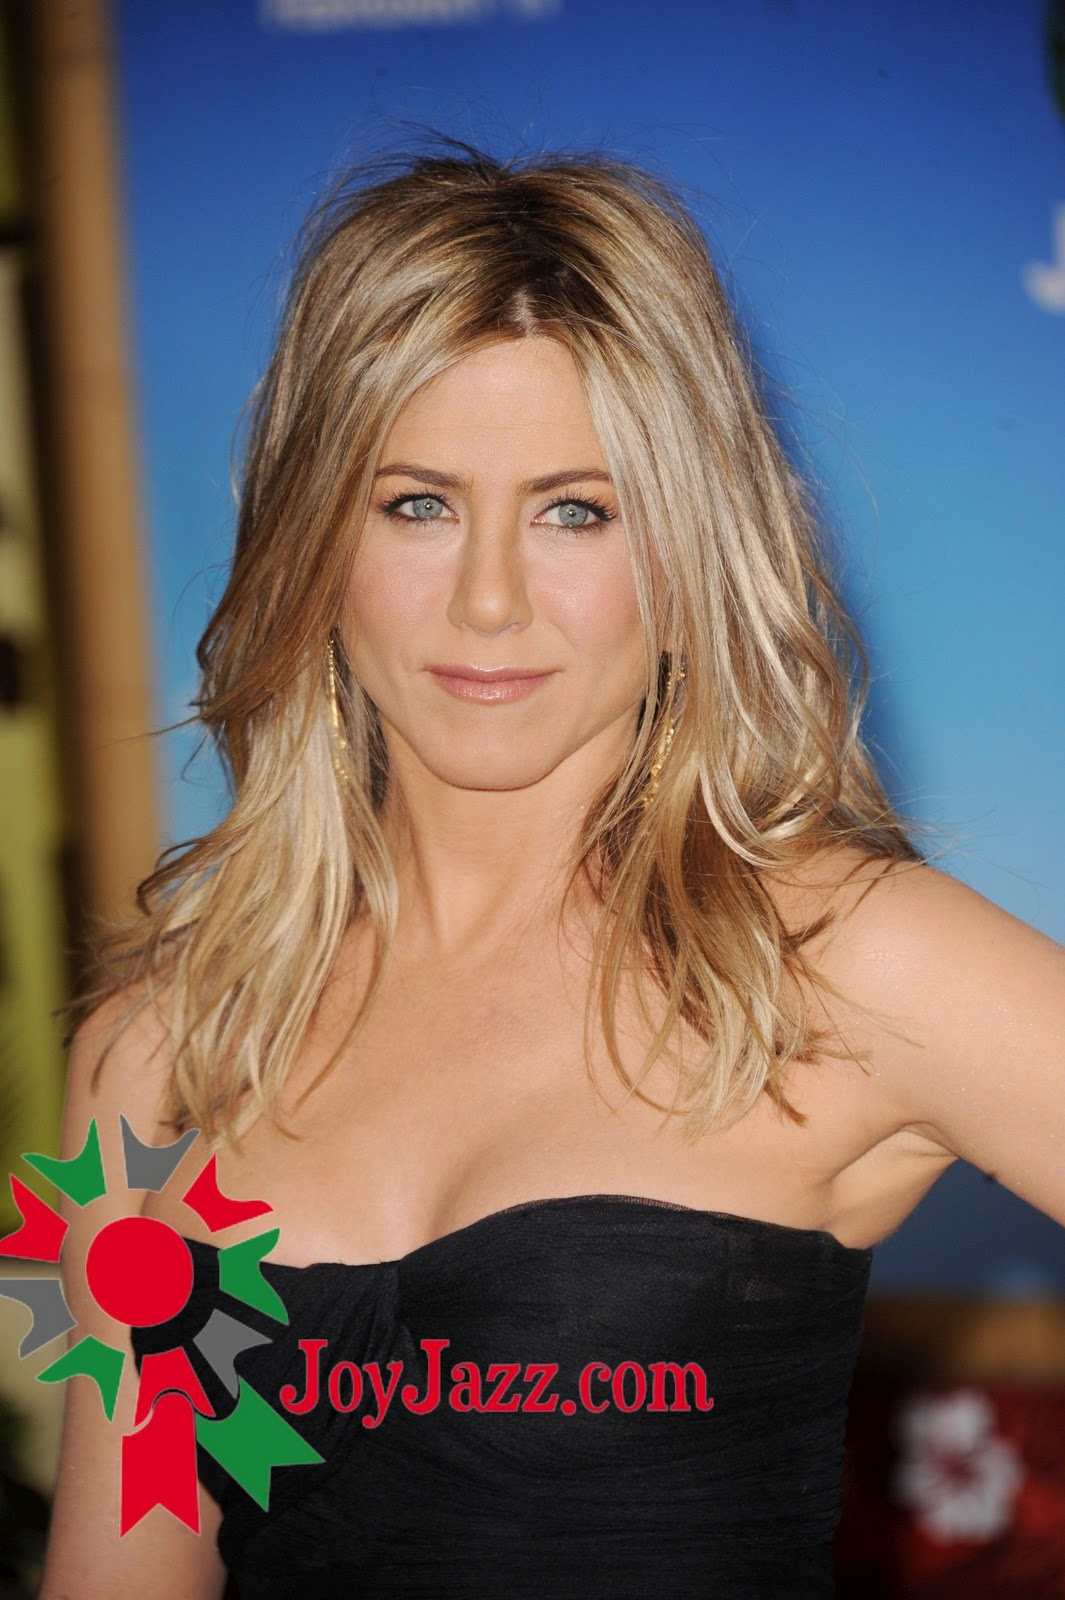 http://1.bp.blogspot.com/-Cl-_b17v_IY/TV5-ABtnwFI/AAAAAAAACl0/_LOWisPnVwc/s1600/Jennifer-Aniston-10.jpg